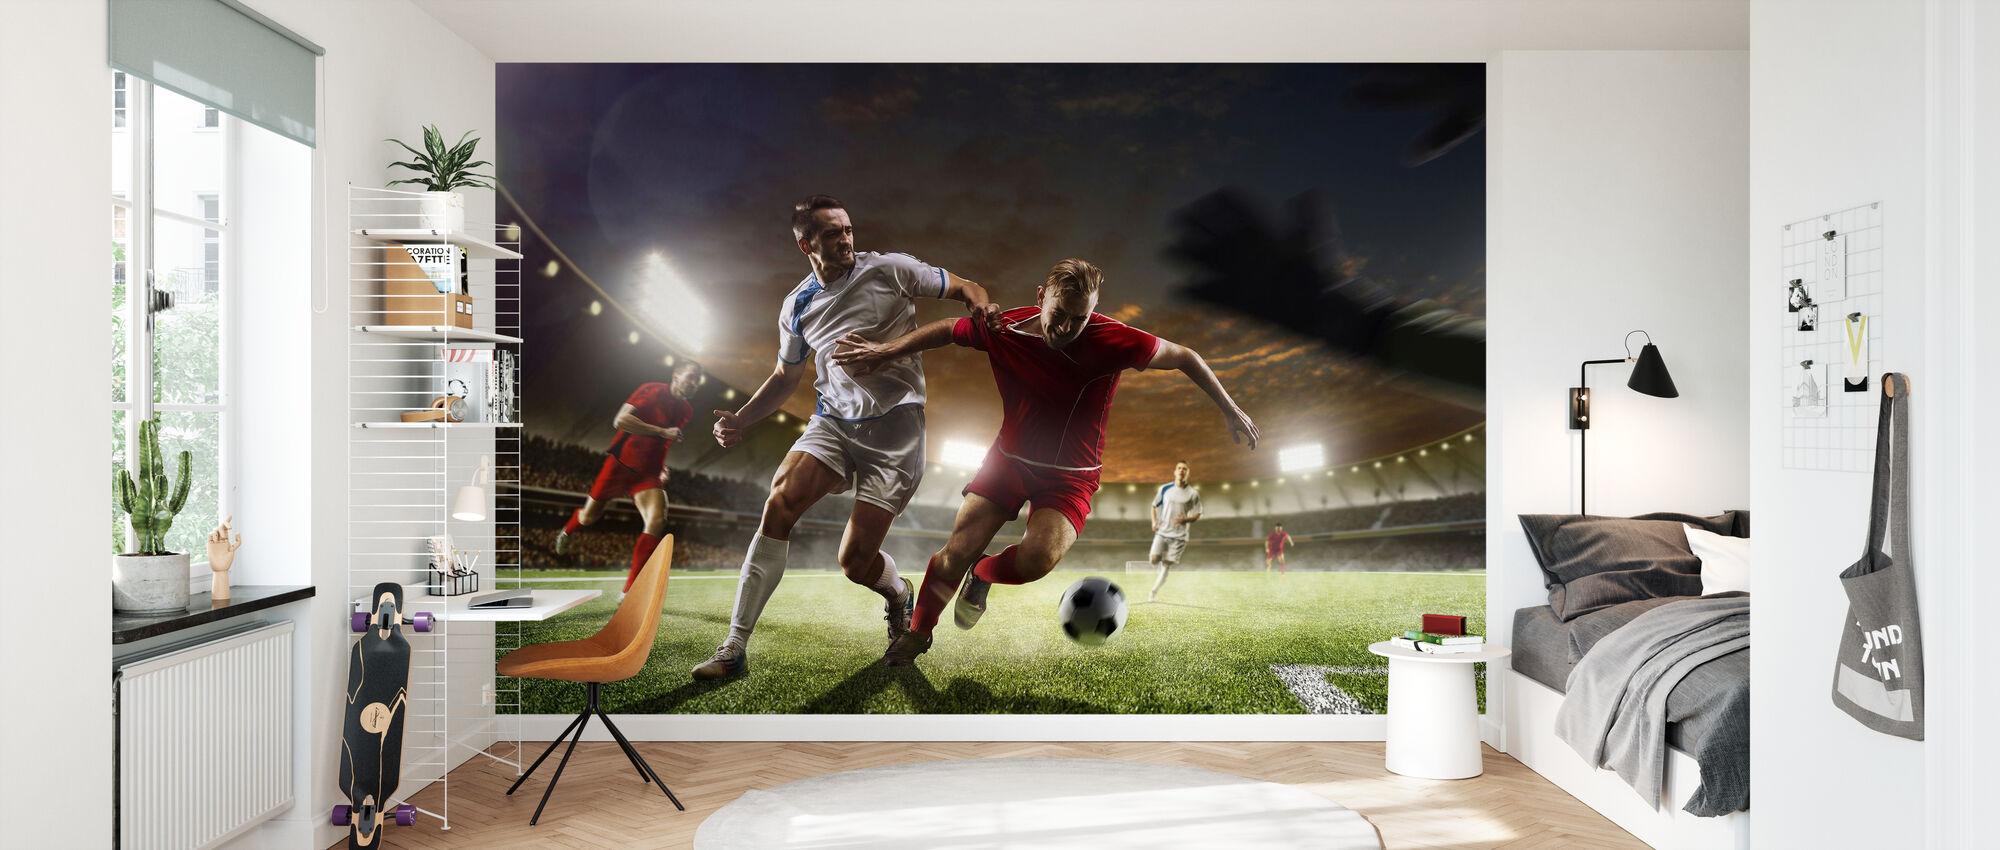 Playing Soccer - Wallpaper - Kids Room